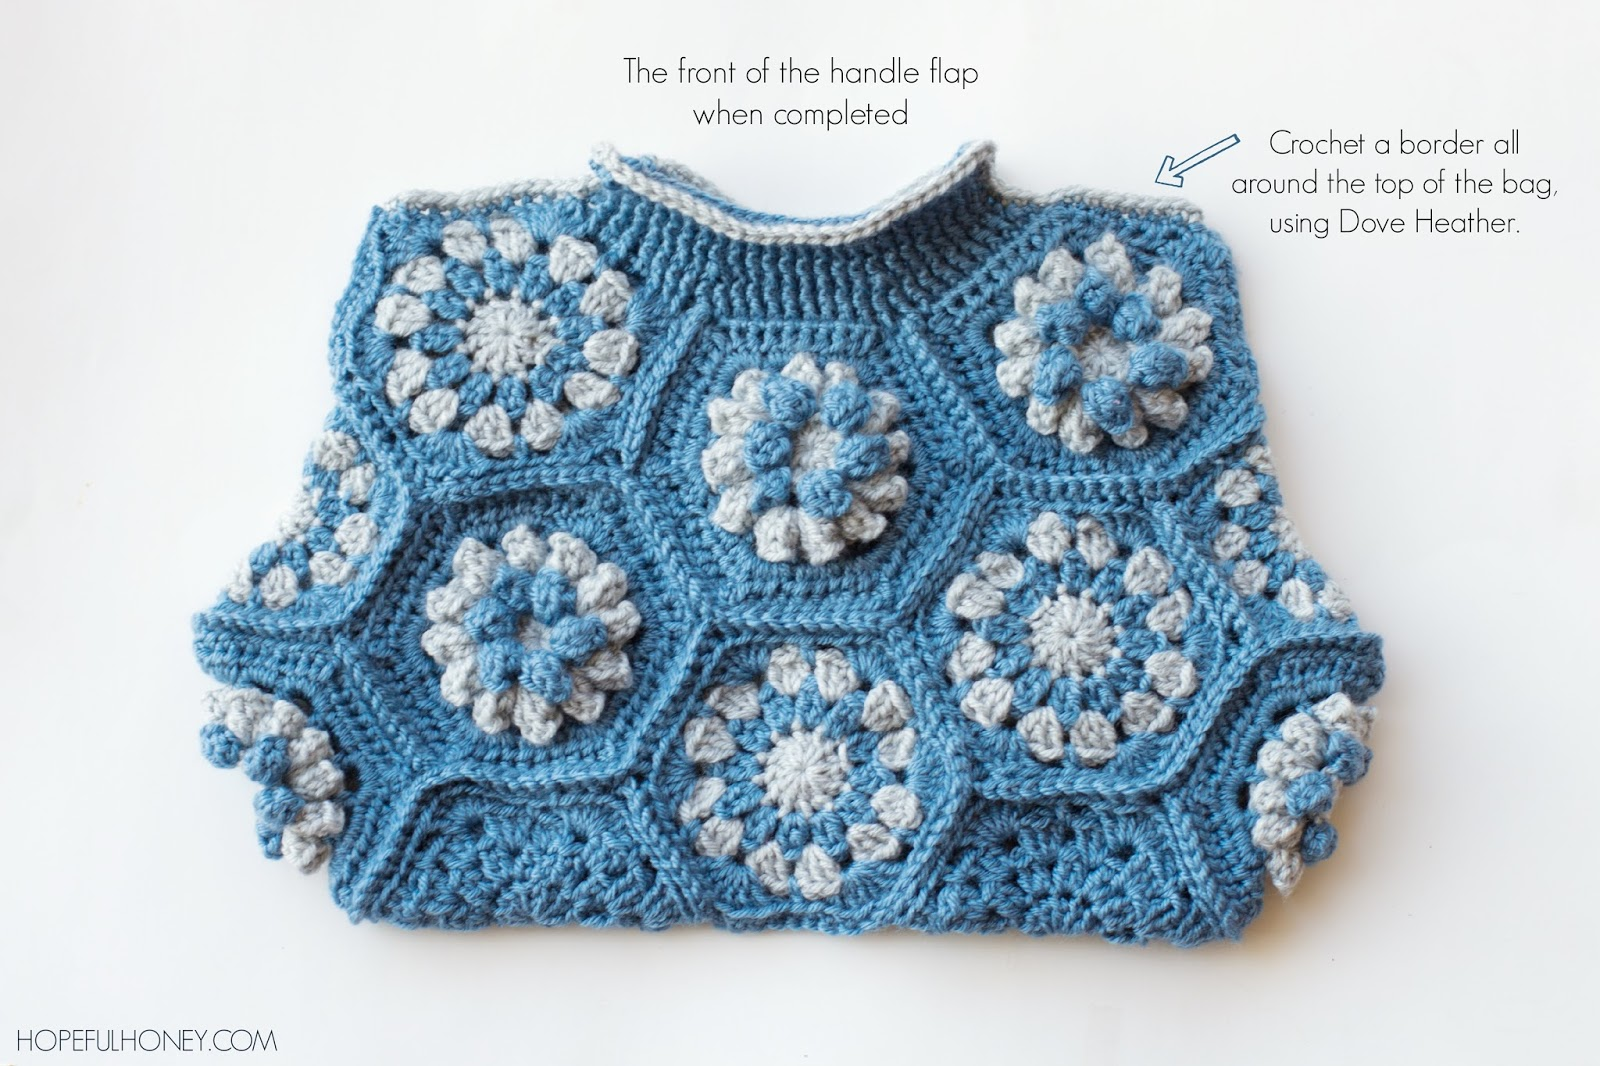 ... Honey Craft, Crochet, Create: Dahlia Hexagon Handbag Crochet Pattern